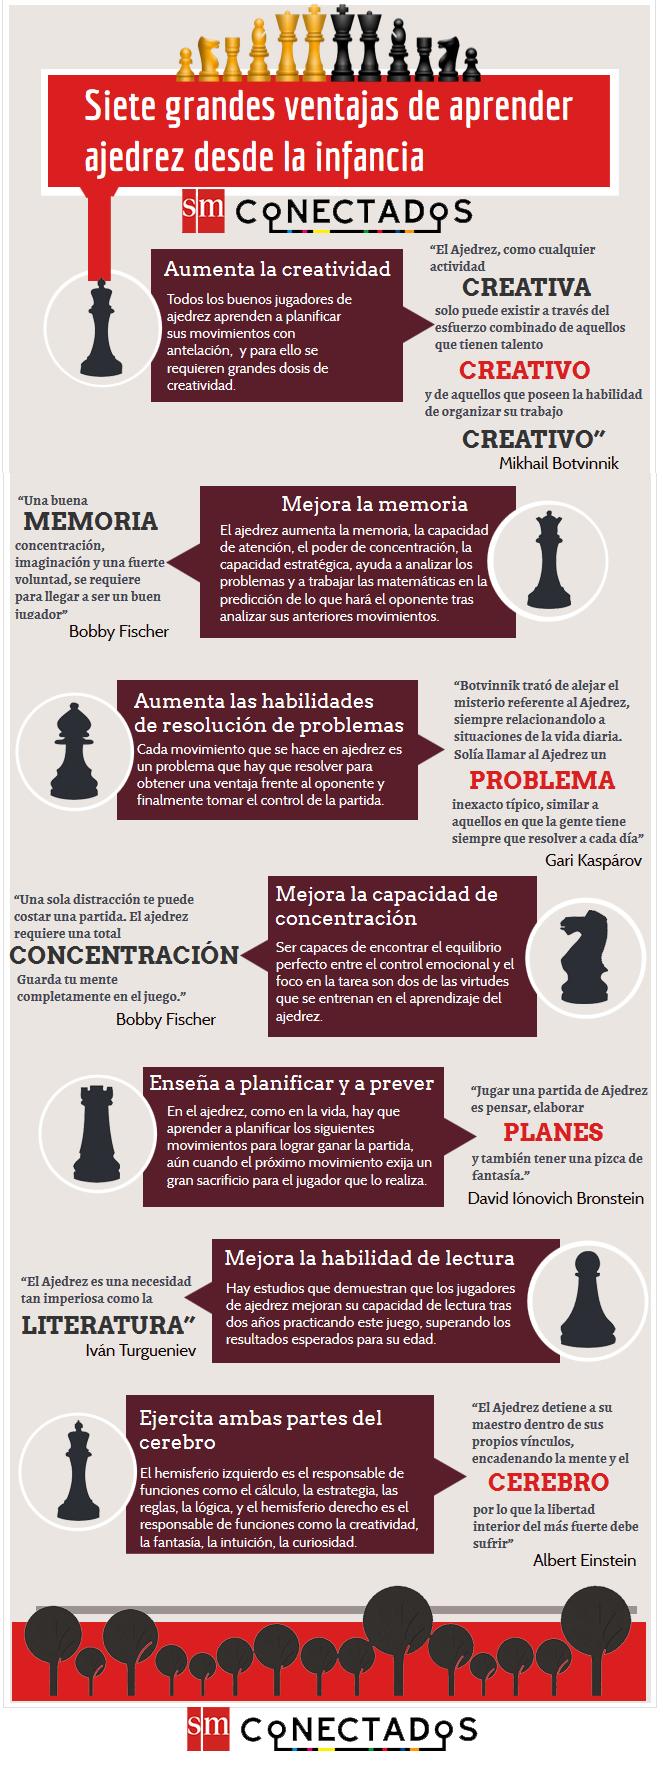 7 VENTAJAS DE APRENDER AJEDREZ DESDE LA INFANCIA